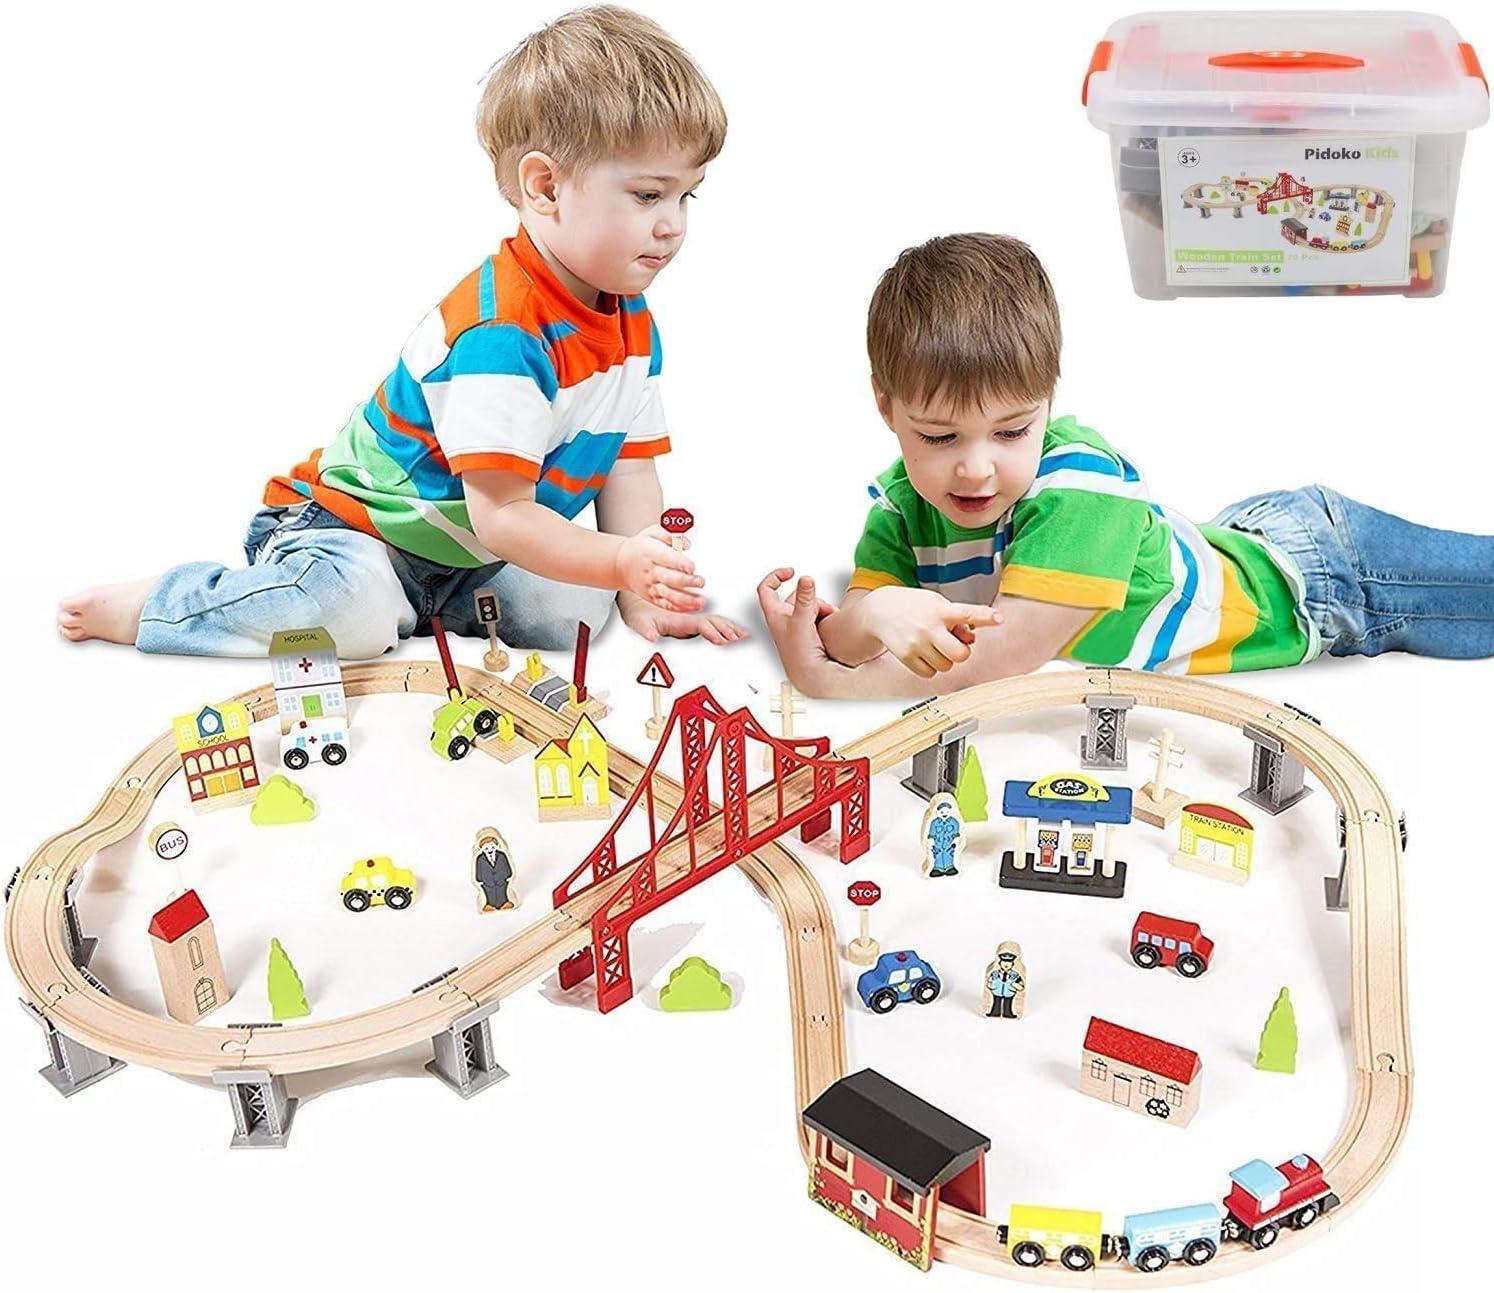 Pidoko Kids Wooden Train Set - City Seasonal Wrap Introduction Highway 70 Railway Super Pie Free shipping